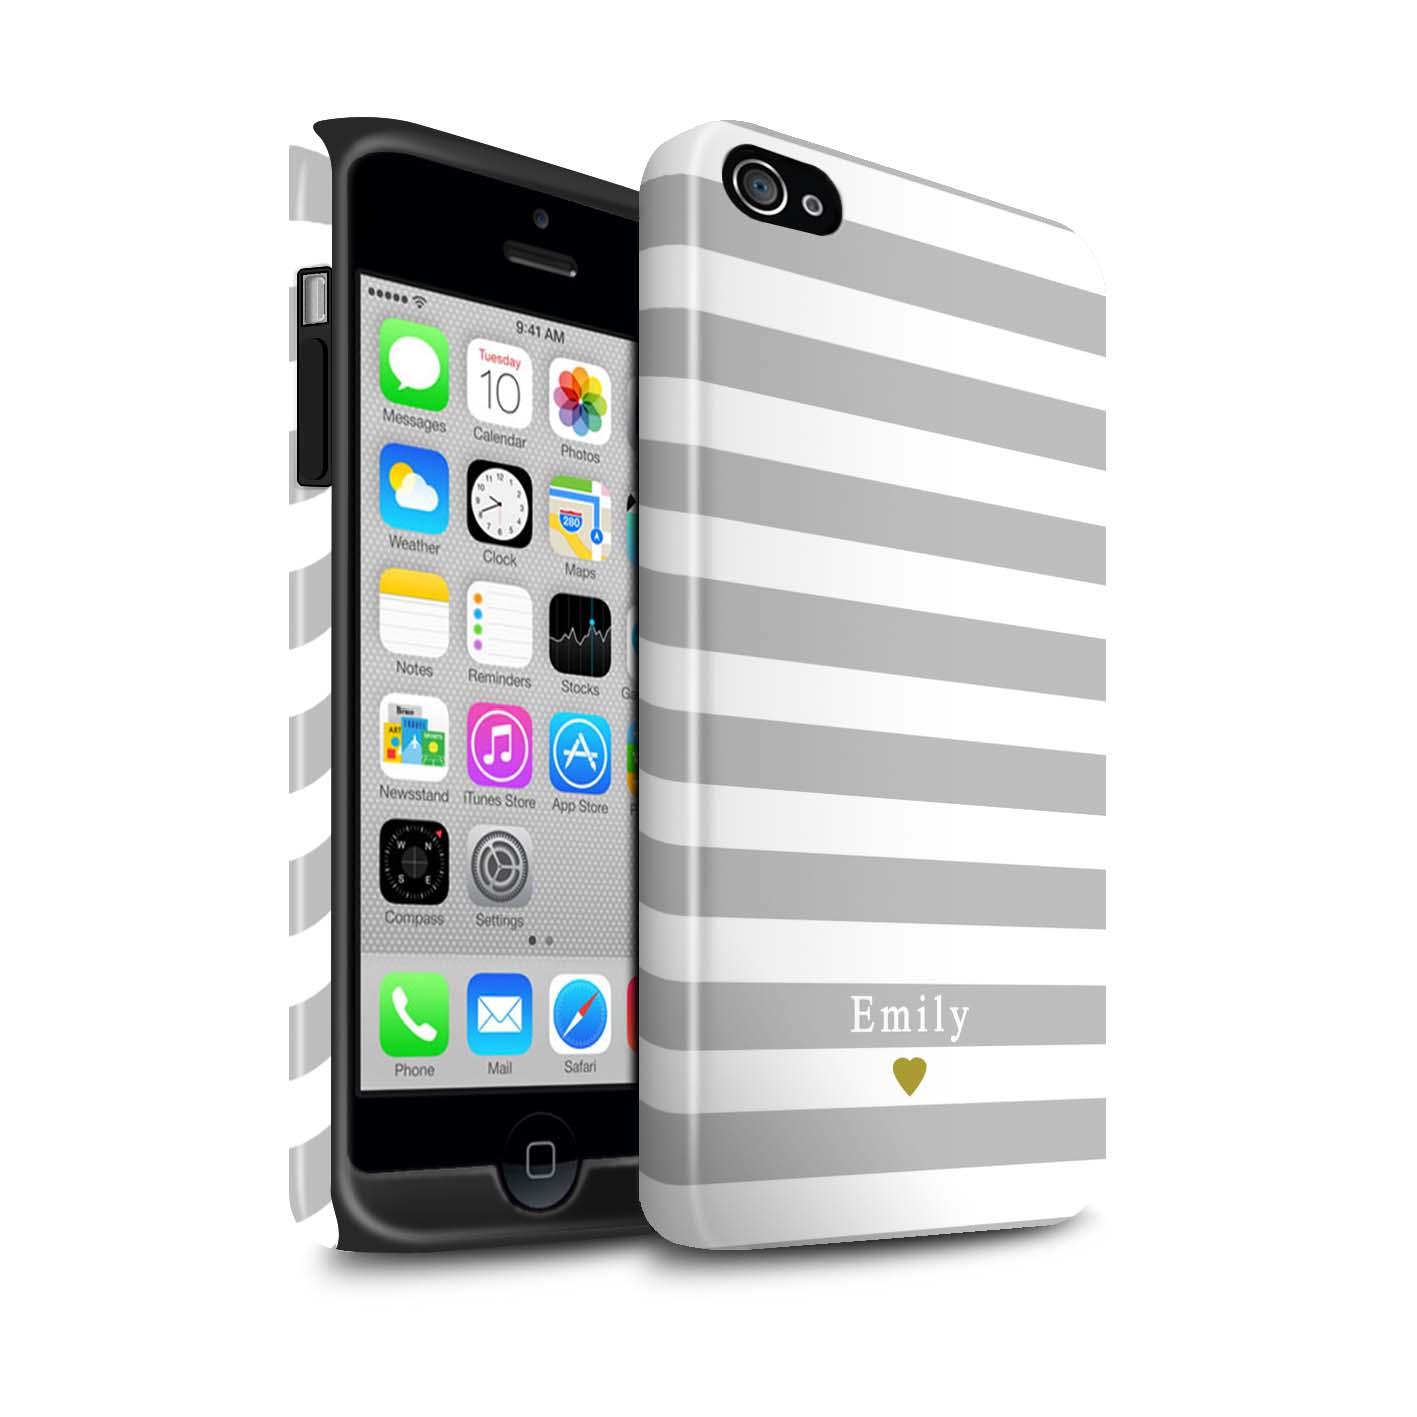 Personnalise-Rayures-Raye-Coutume-Coque-Etui-Brillant-pour-Apple-iPhones-Nom